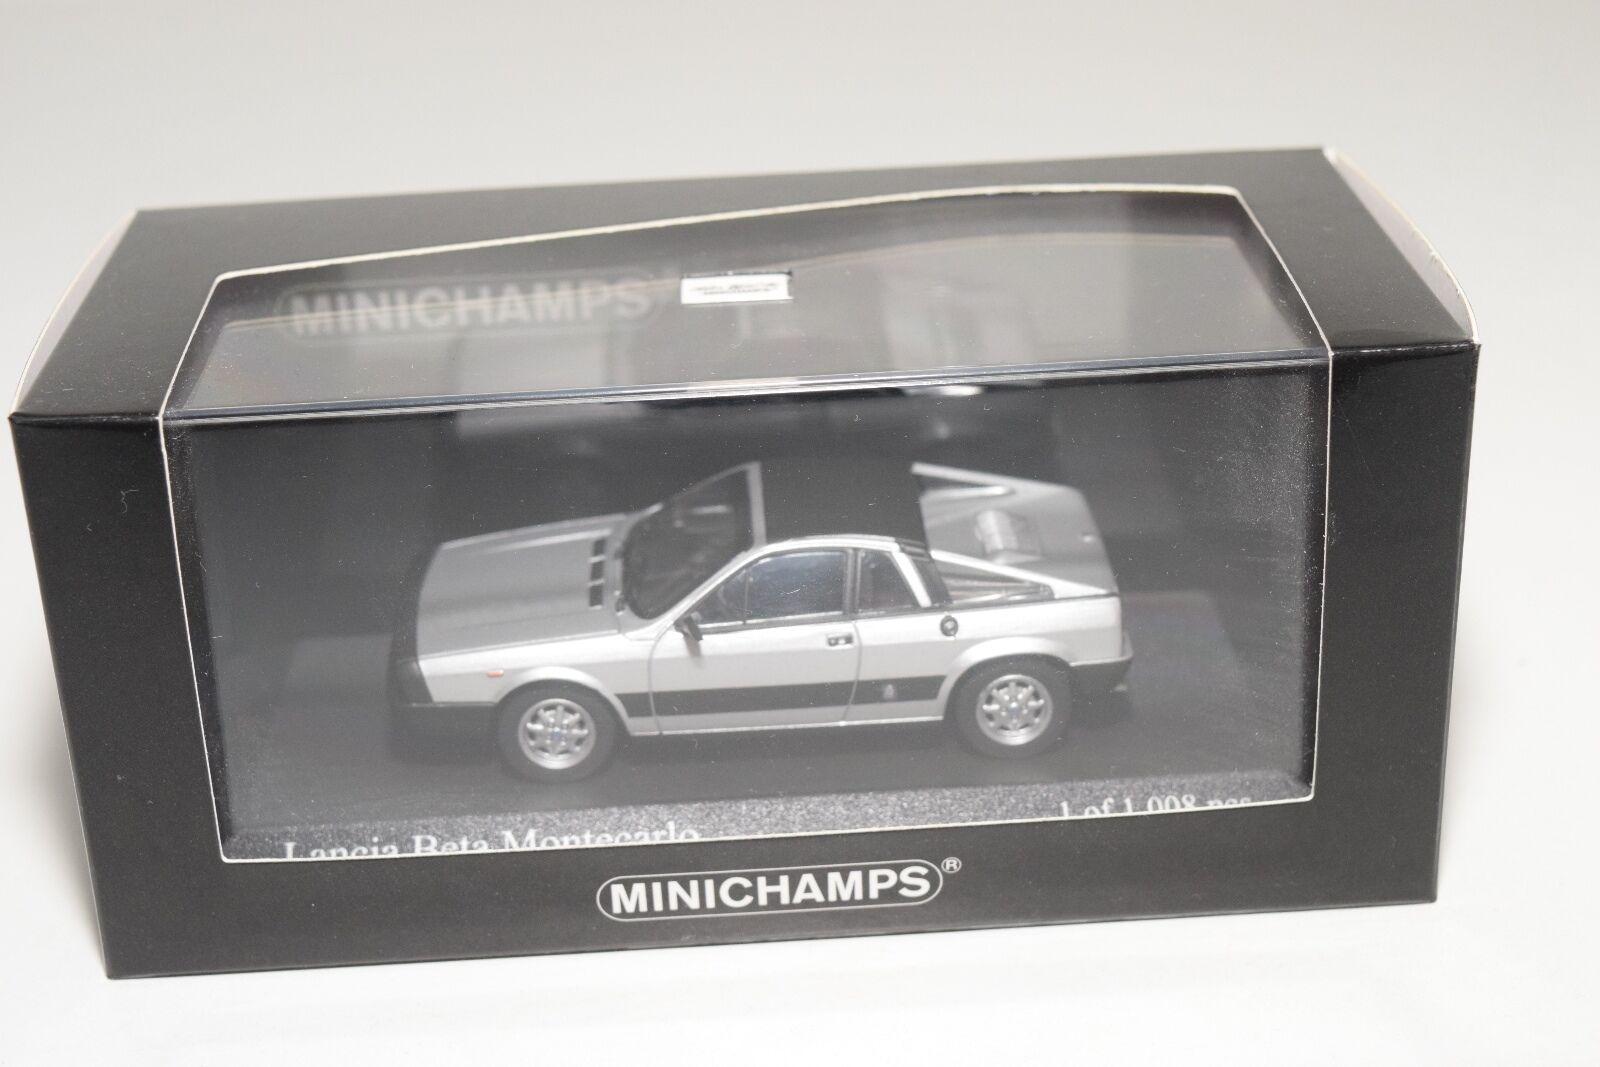 . . . MINICHAMPS LANCIA BETA MONTECARLO 1980 plata gris MINT BOXED c70c79